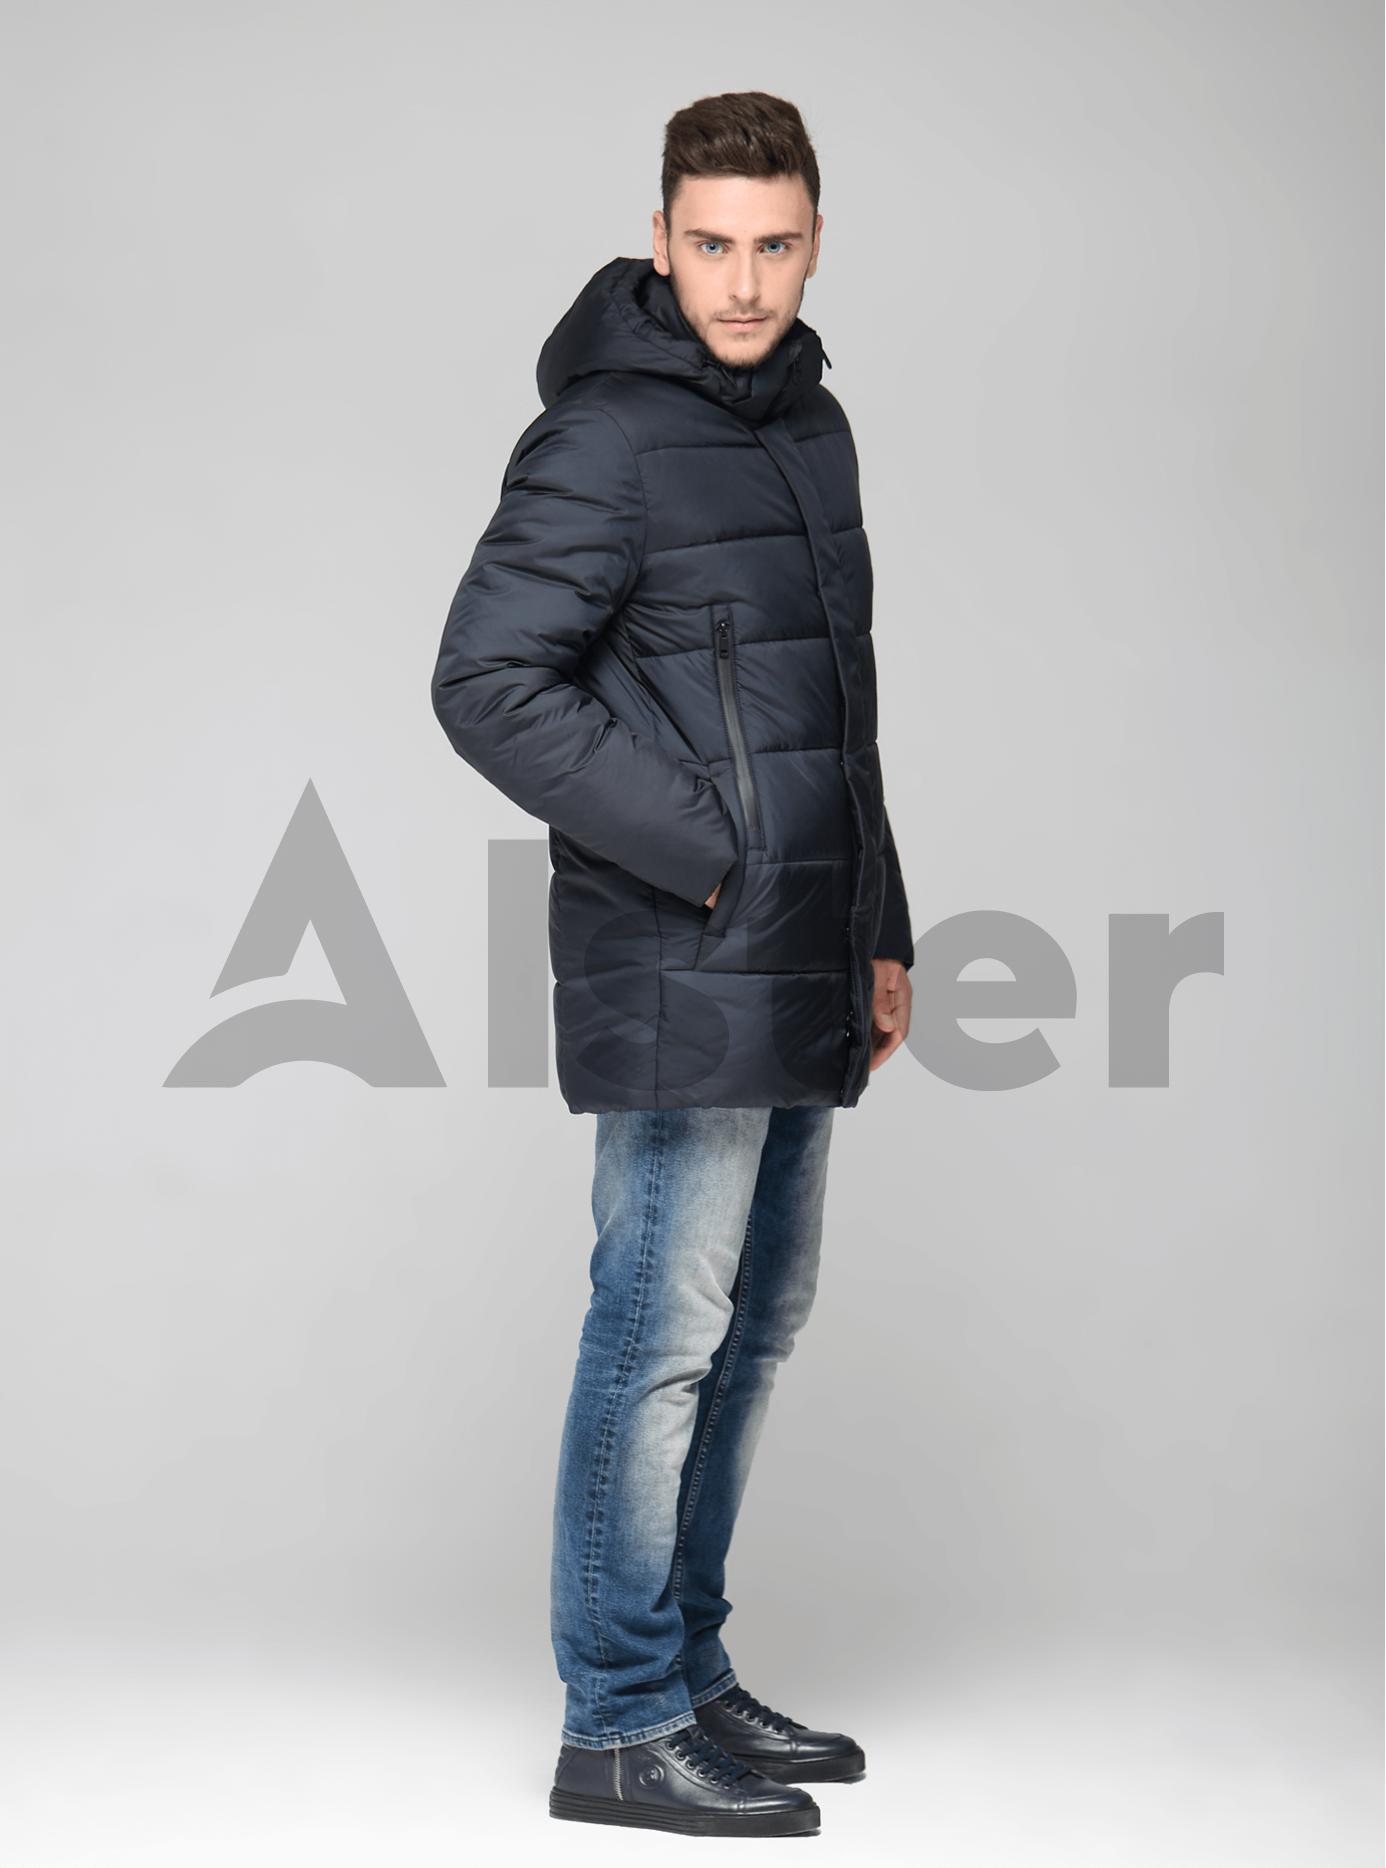 Мужская куртка зимняя с капюшоном Тёмно-синий 46 (02-MT19261): фото - Alster.ua